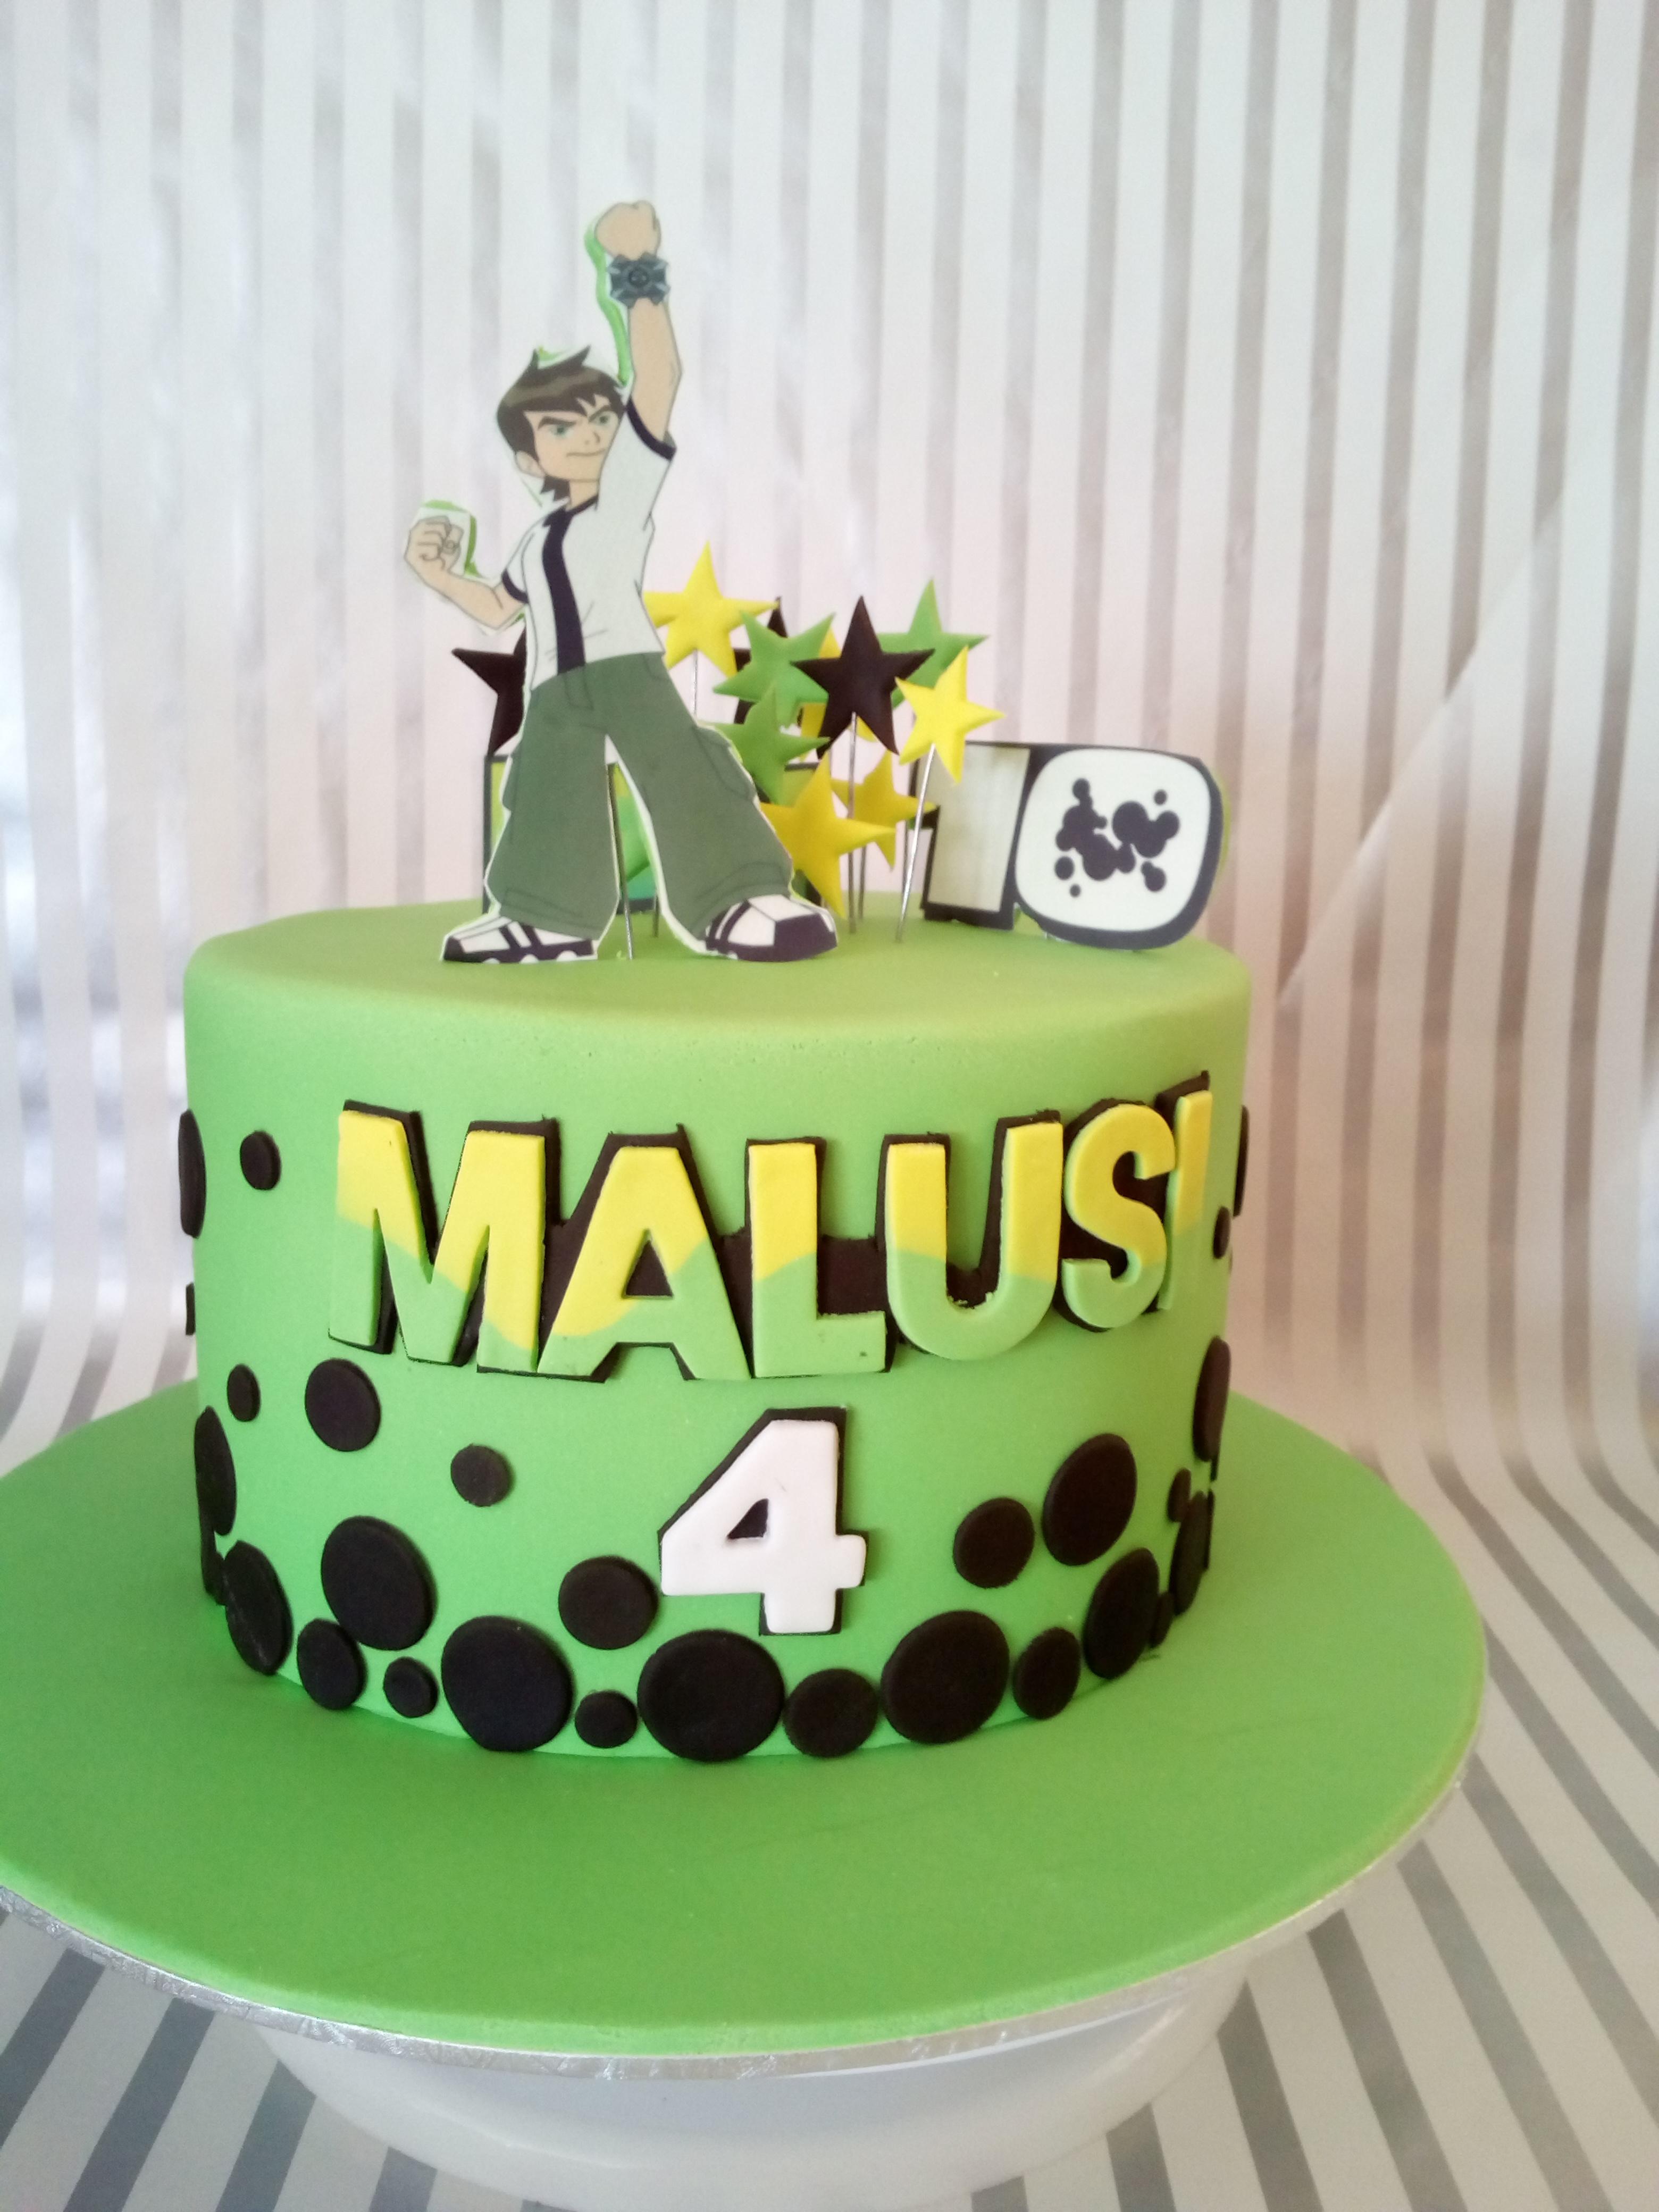 Fantastic Birthday Speciality Cakes Carolnzama Wix Com Carolthecakelady Personalised Birthday Cards Fashionlily Jamesorg